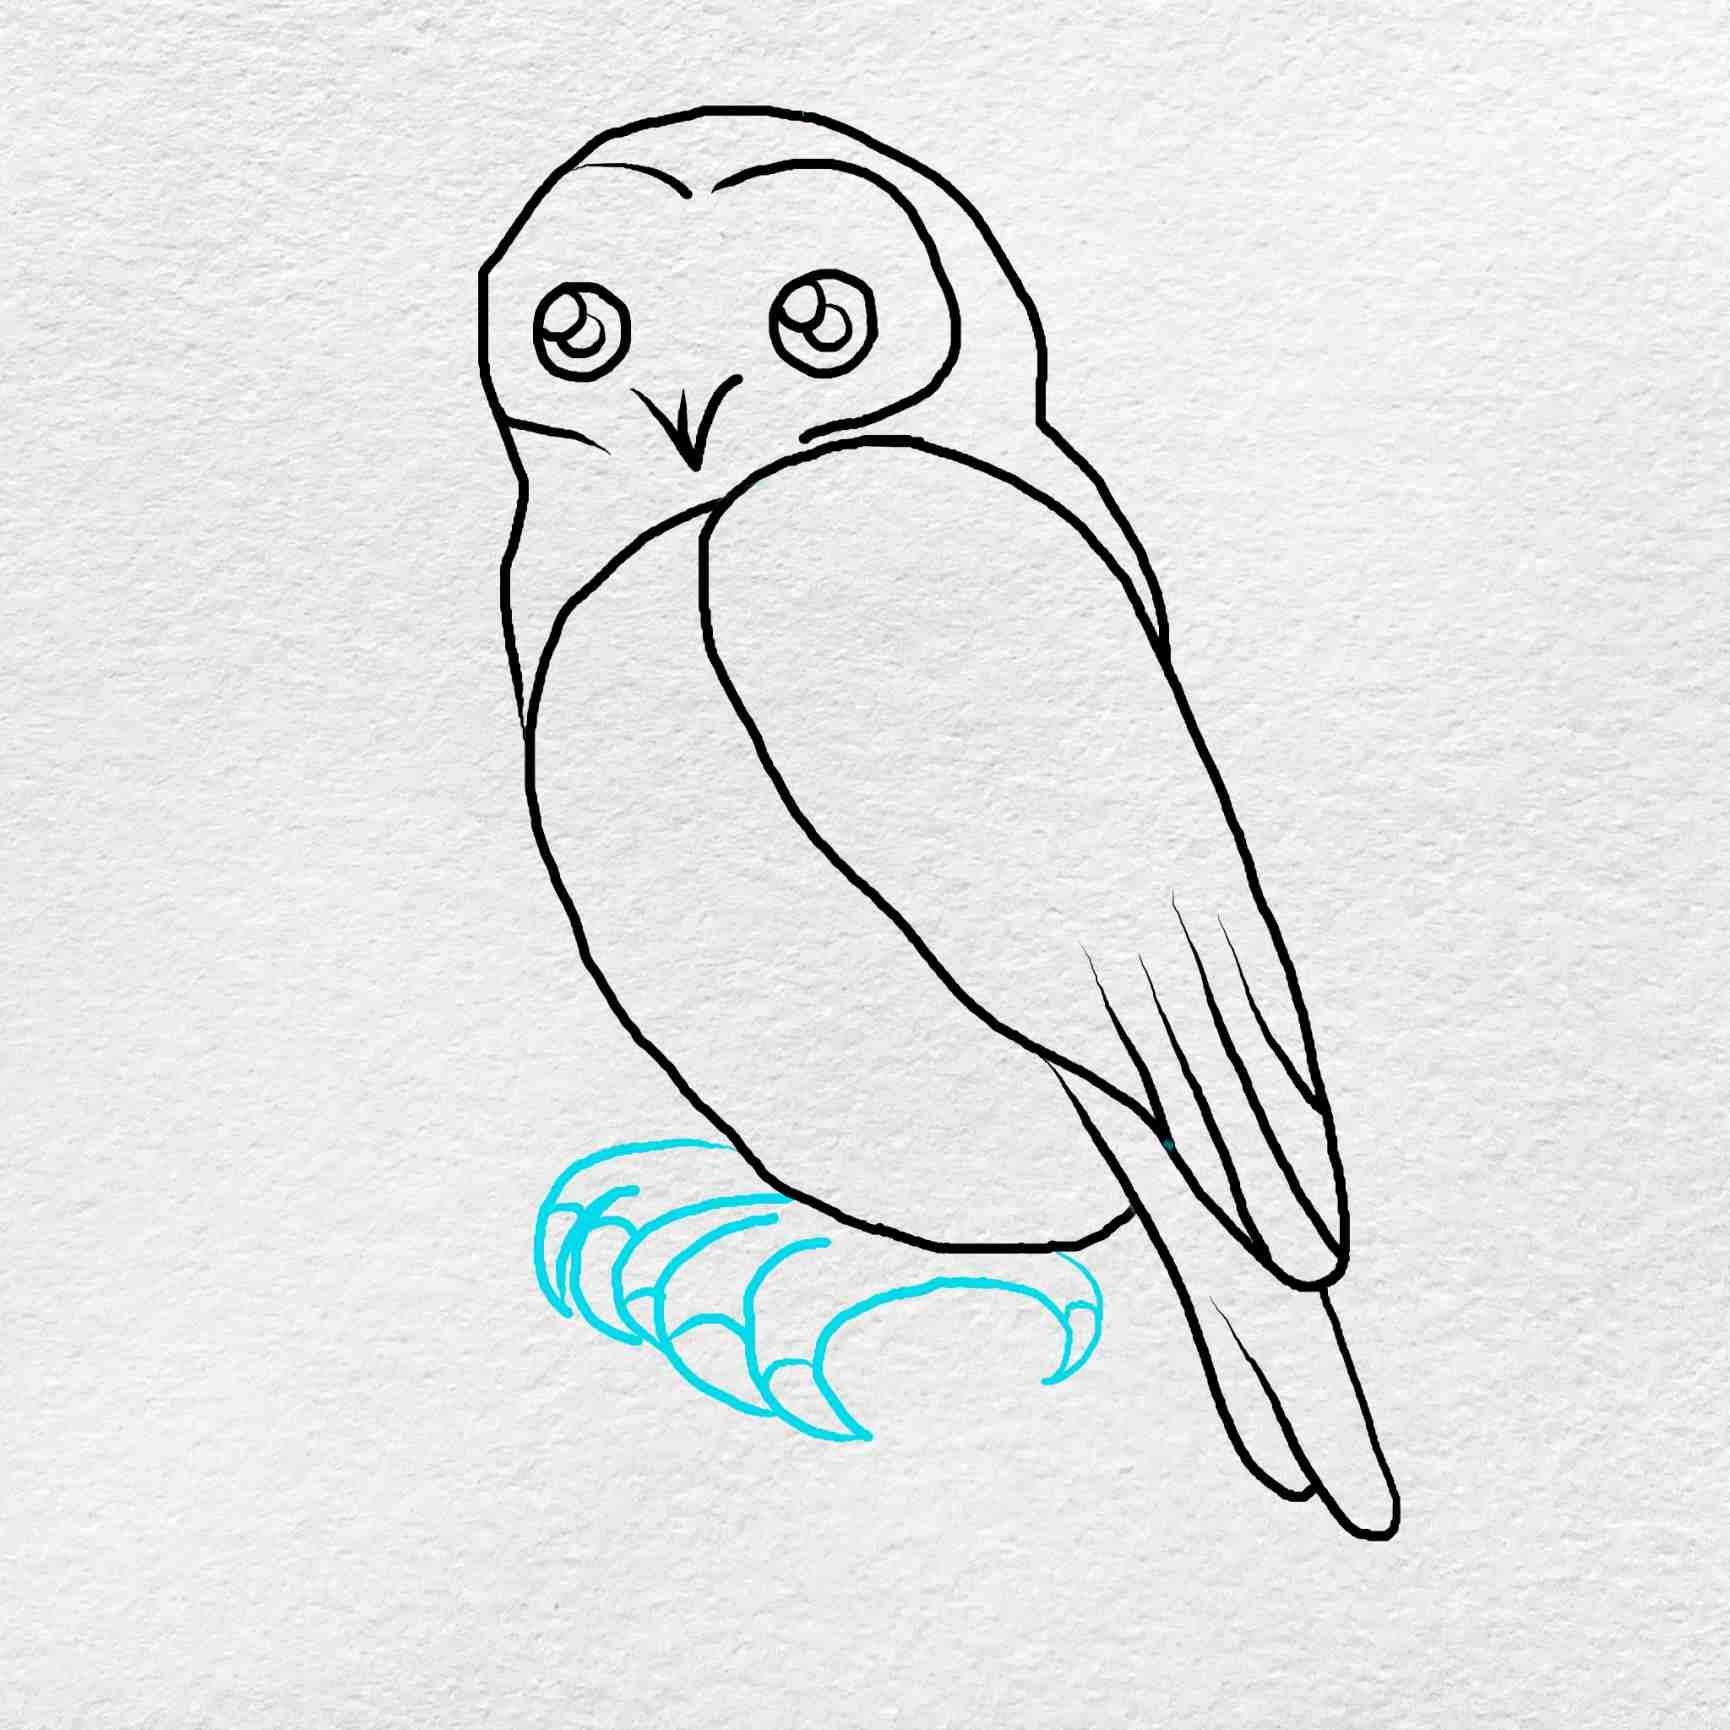 Snowy Owl Drawing: Step 5